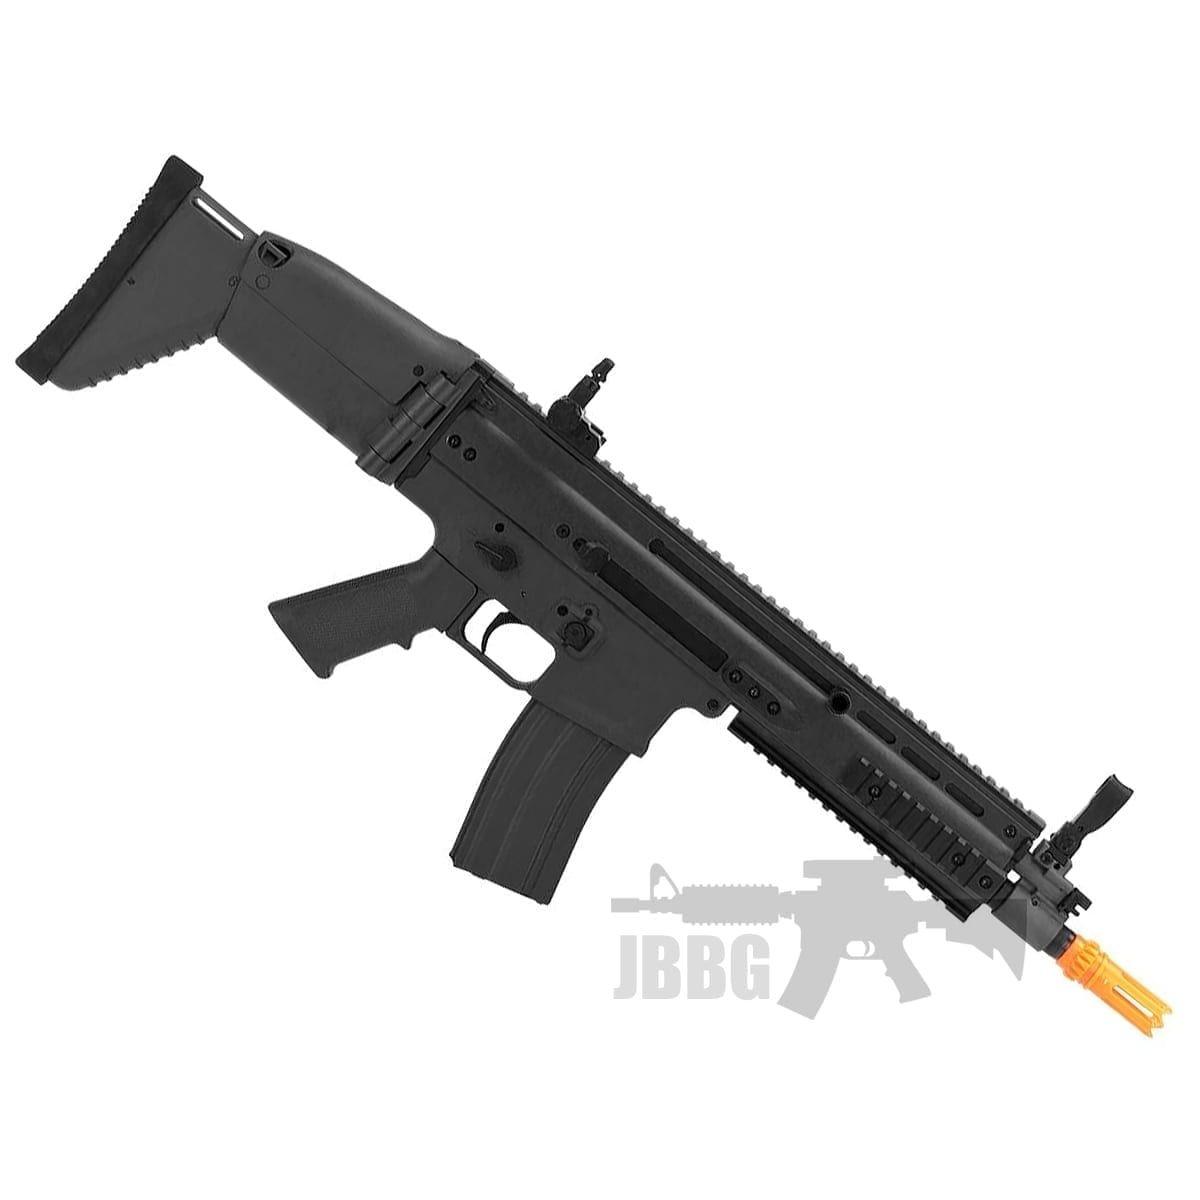 fn-herstal-scar-airsoft-rifle-aeg-electric-best